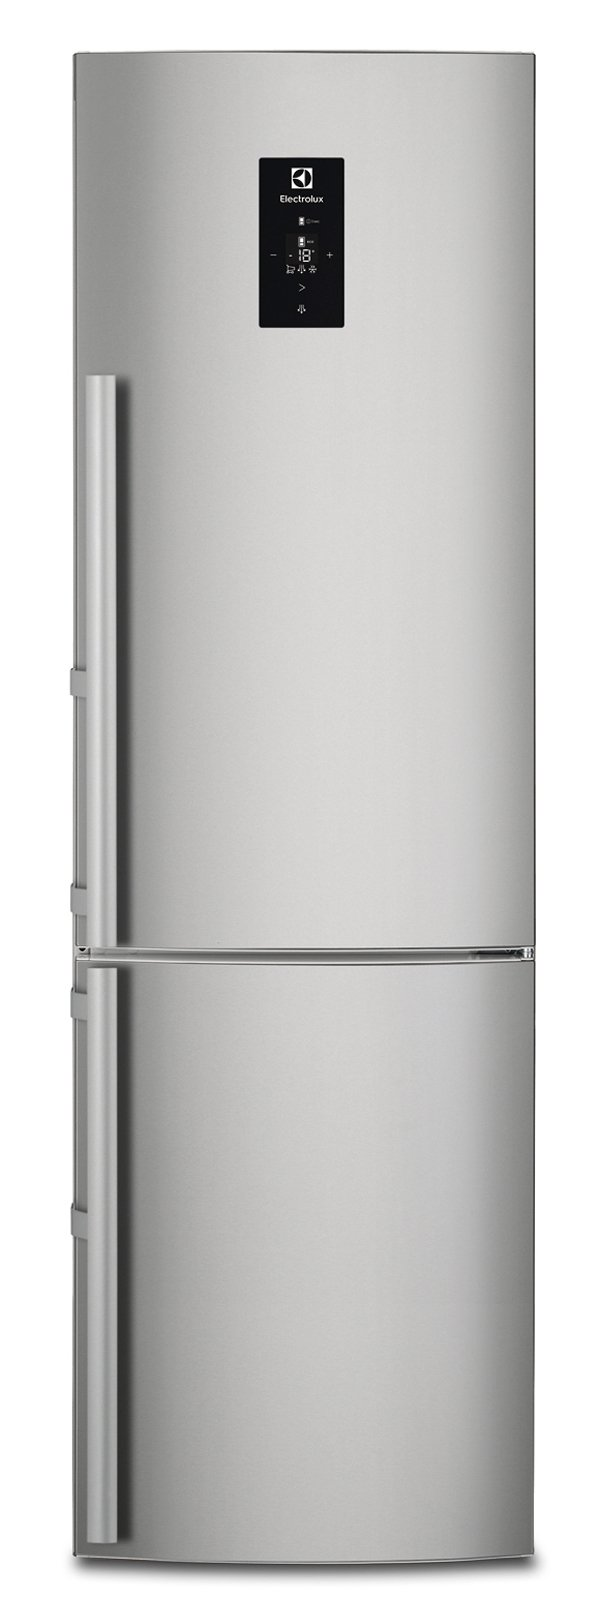 6electrolux-customFlex-EN3889MFX-frigorifero